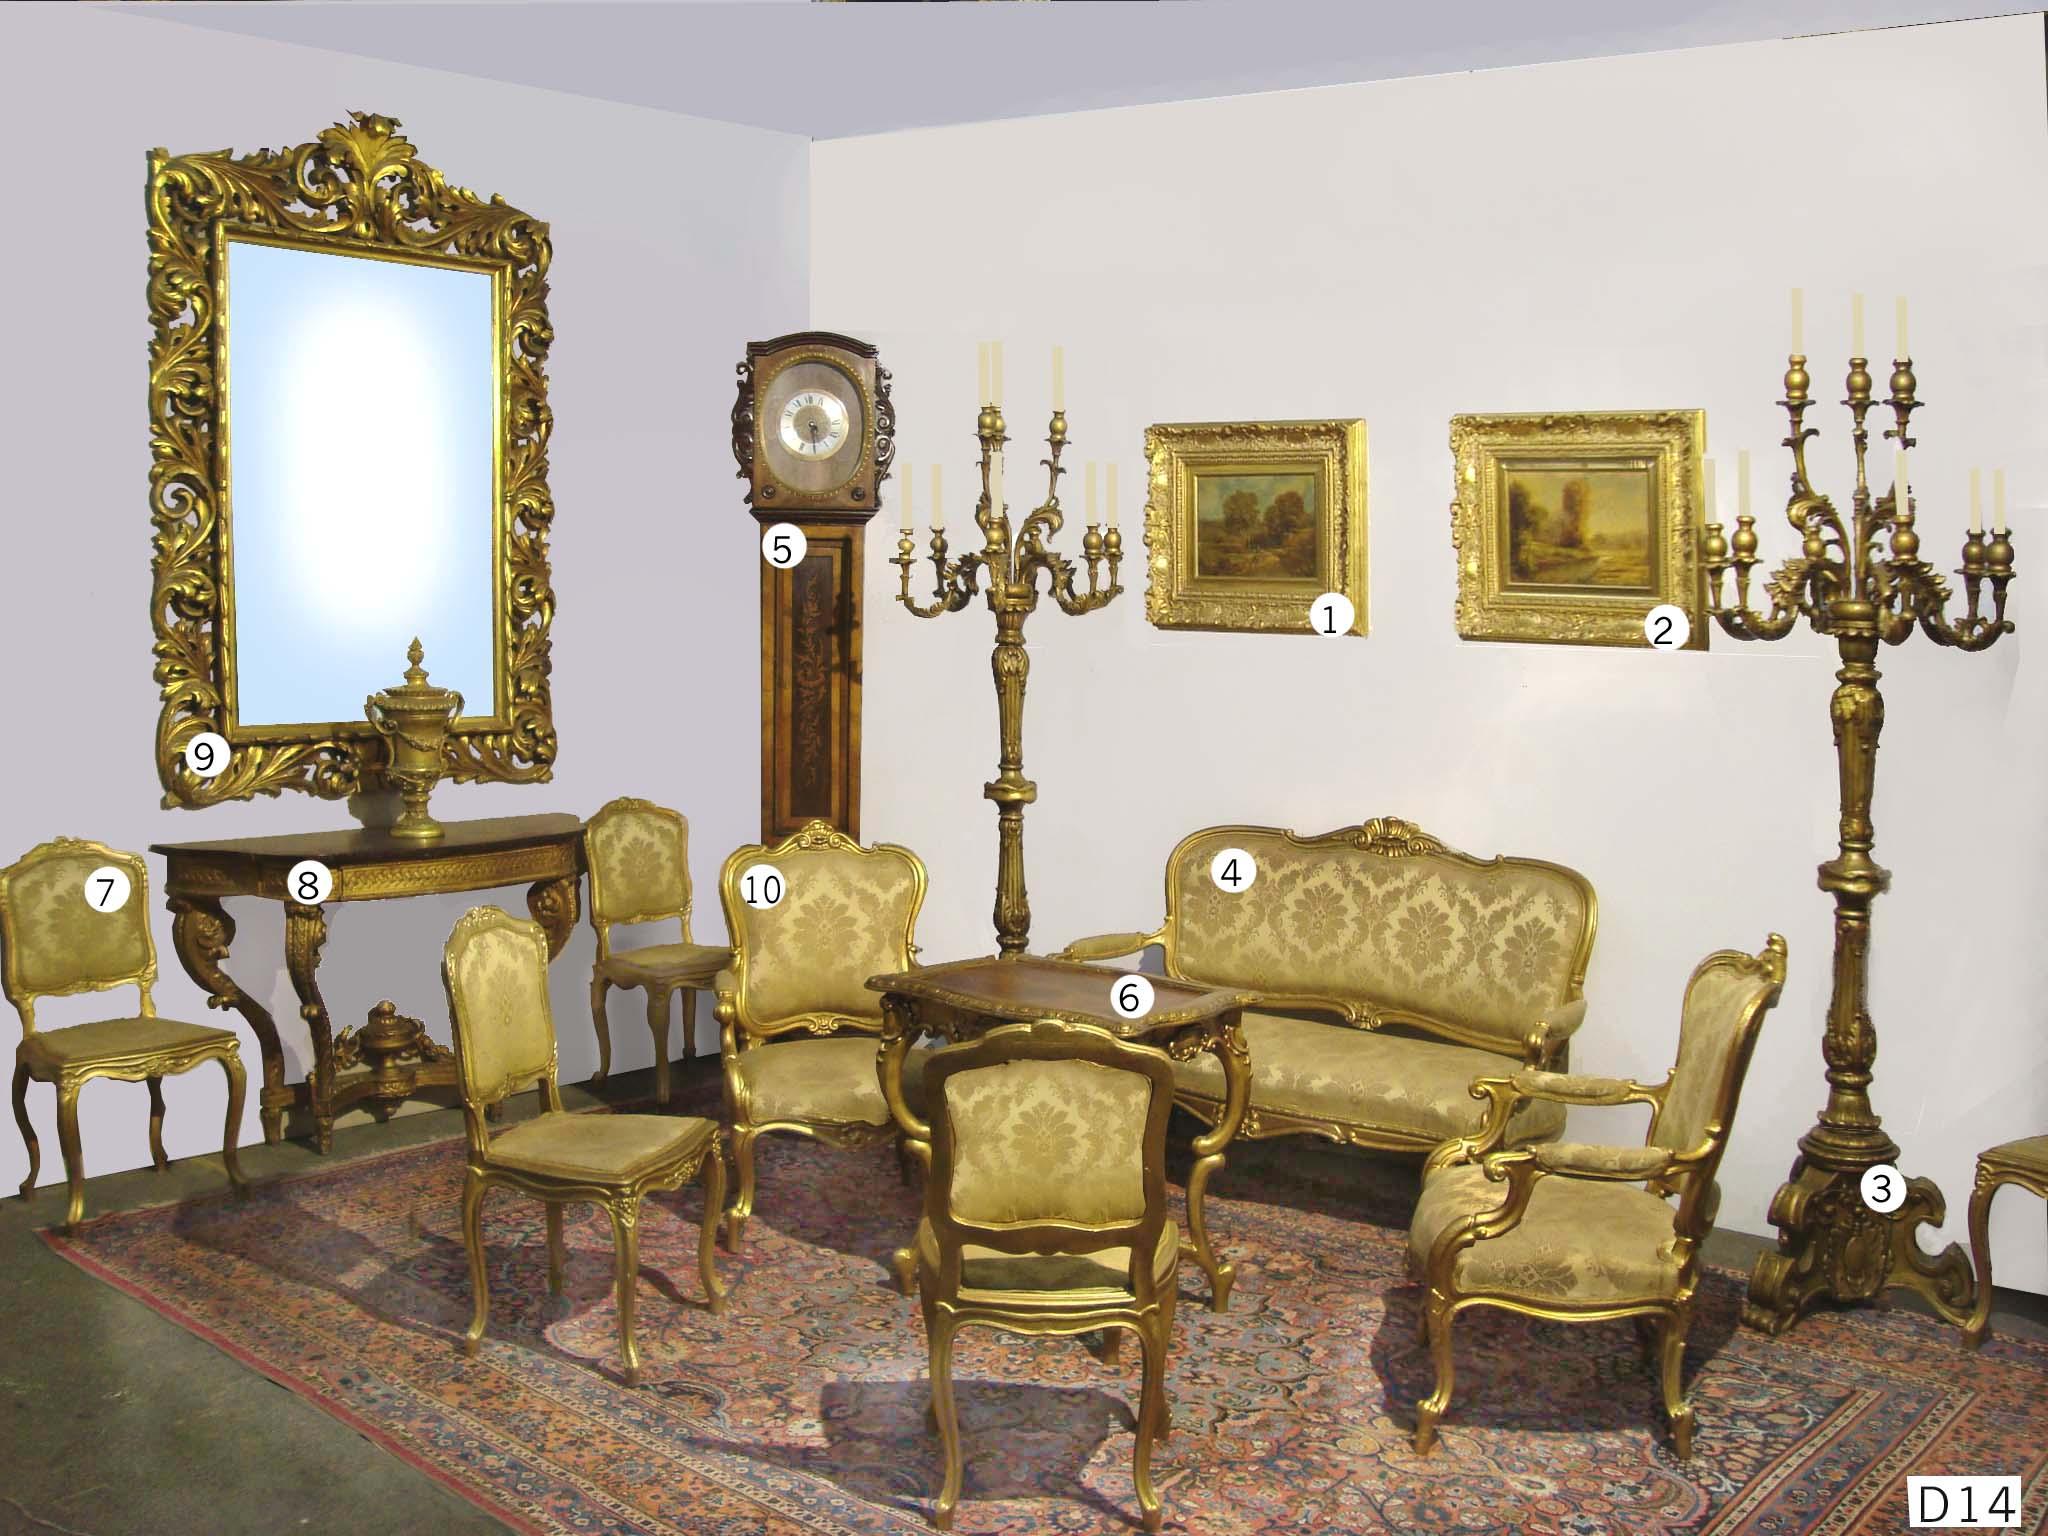 barock m bel mieten leihen mietm bel leihm bel. Black Bedroom Furniture Sets. Home Design Ideas